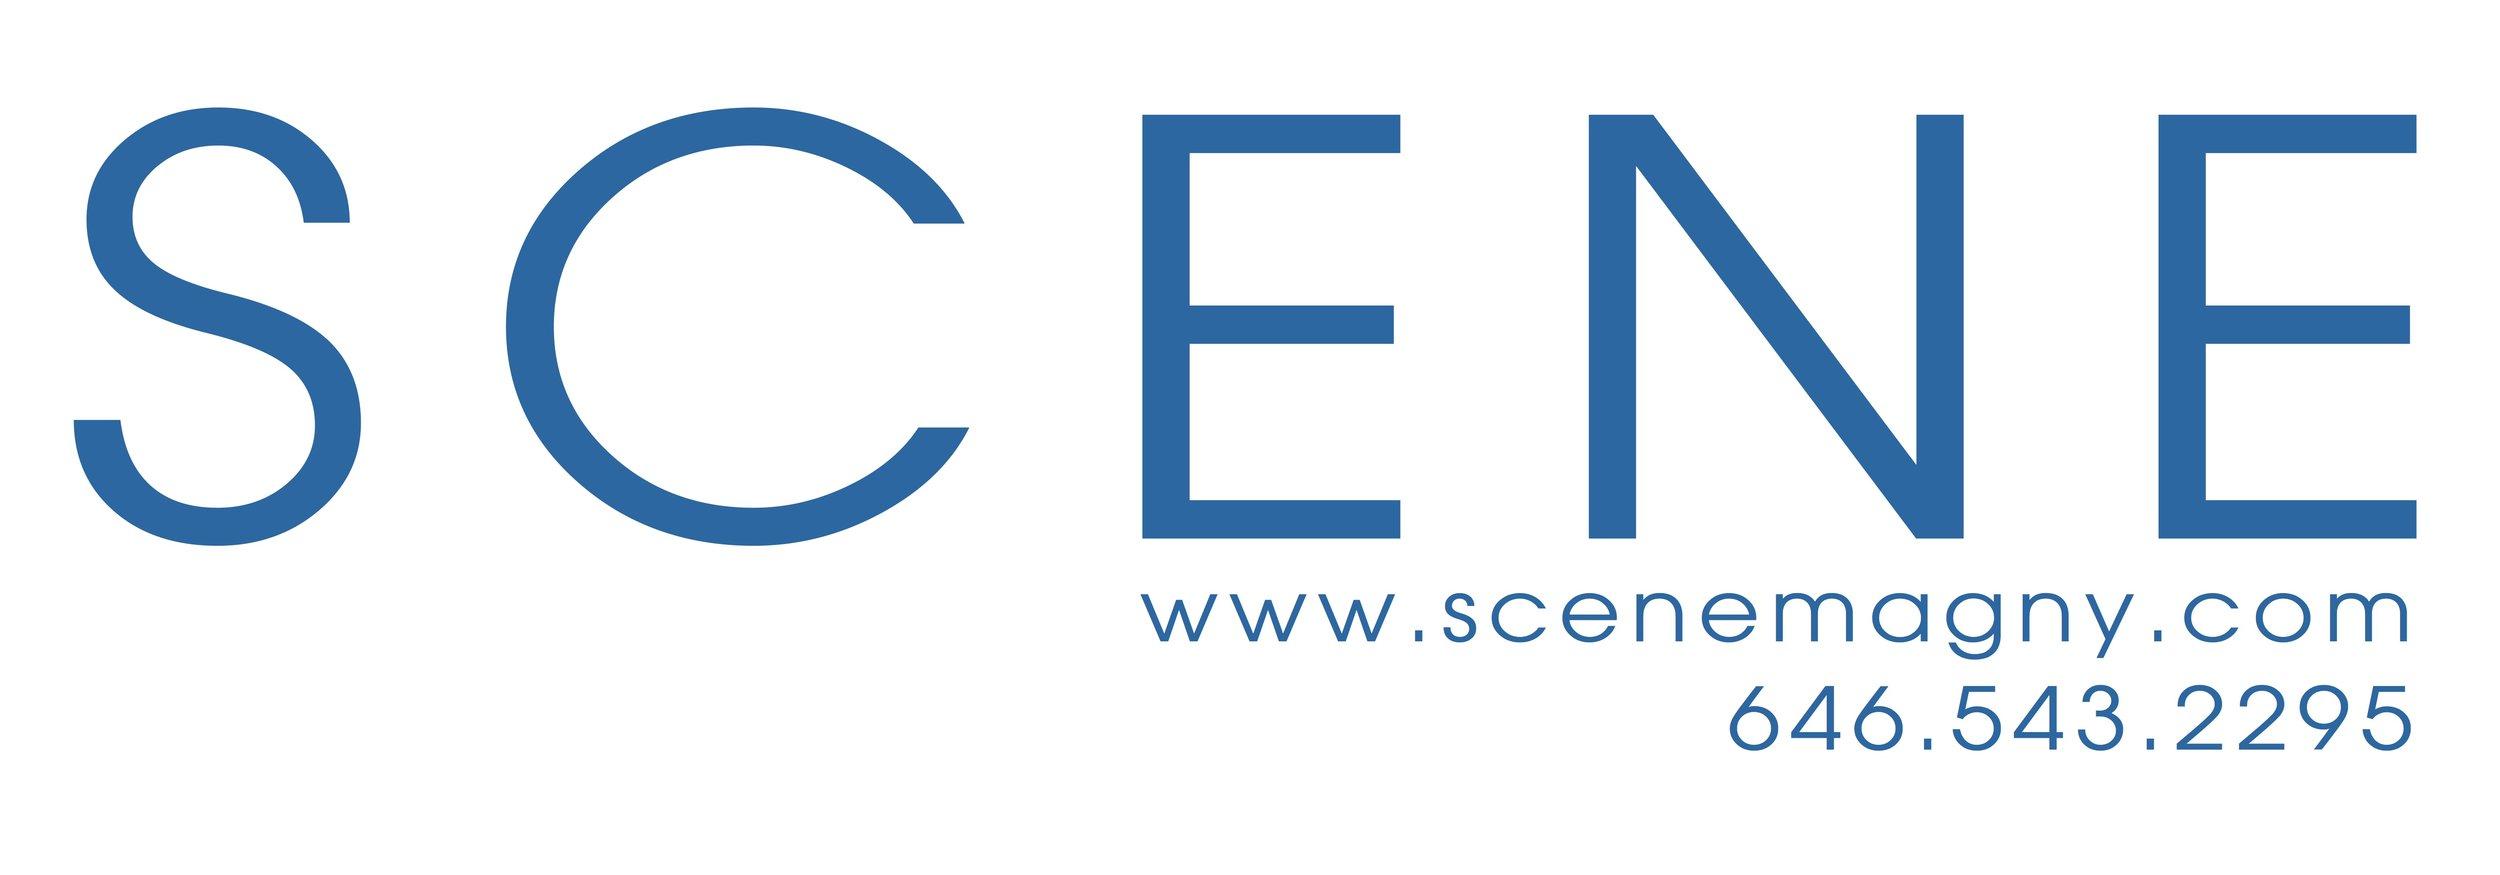 SCENE MAg NY logo.jpg